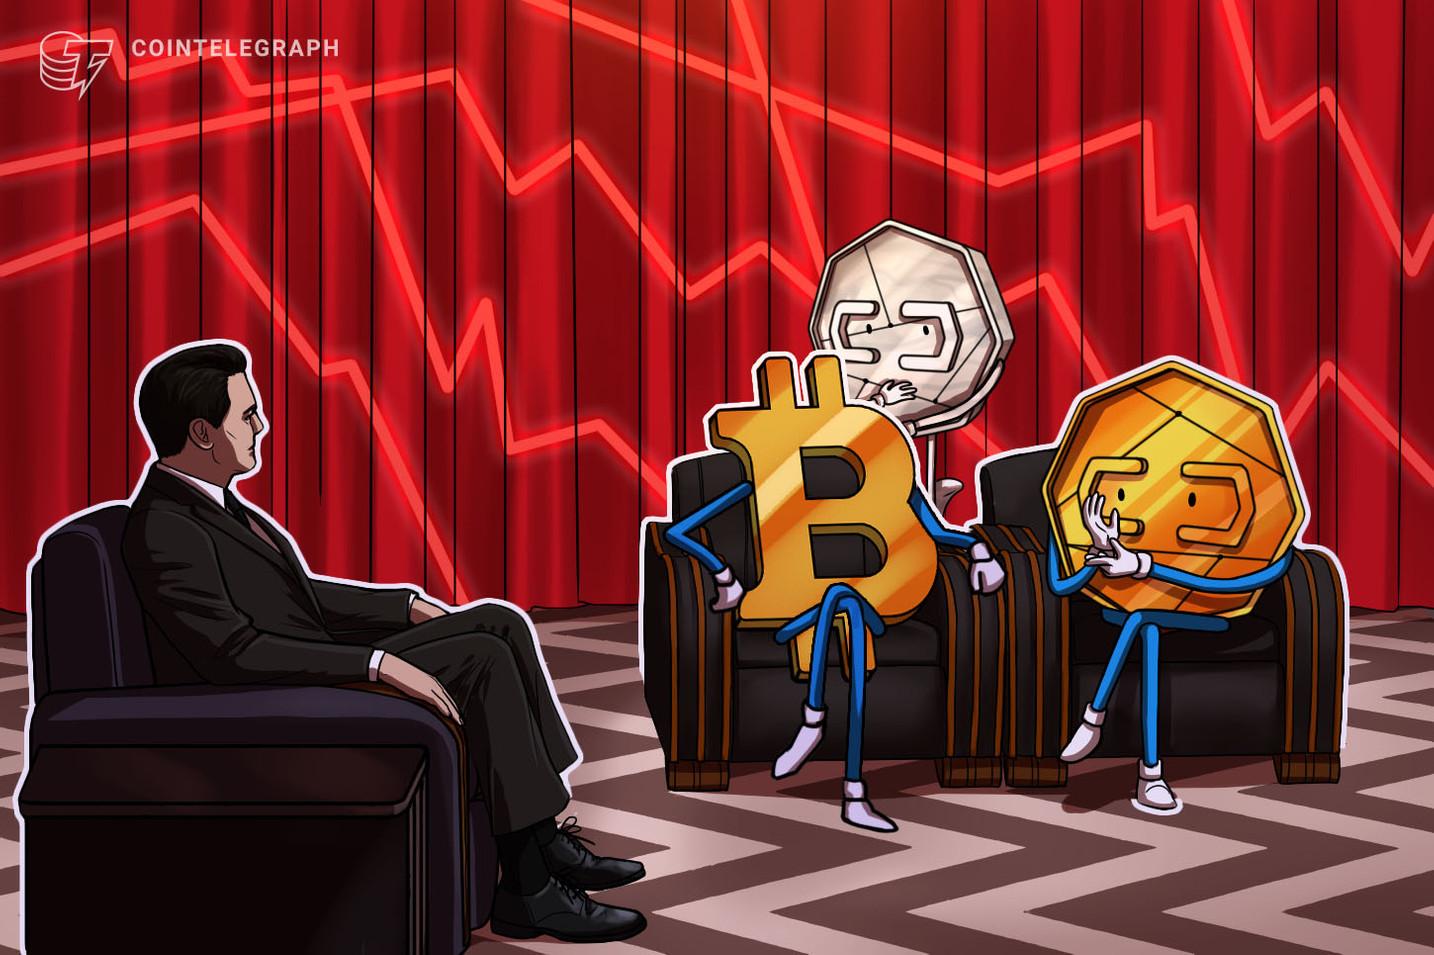 Schlimmer als März 2020? Bitcoin-Kurs rutscht kurz unter 33.000 US-Dollar